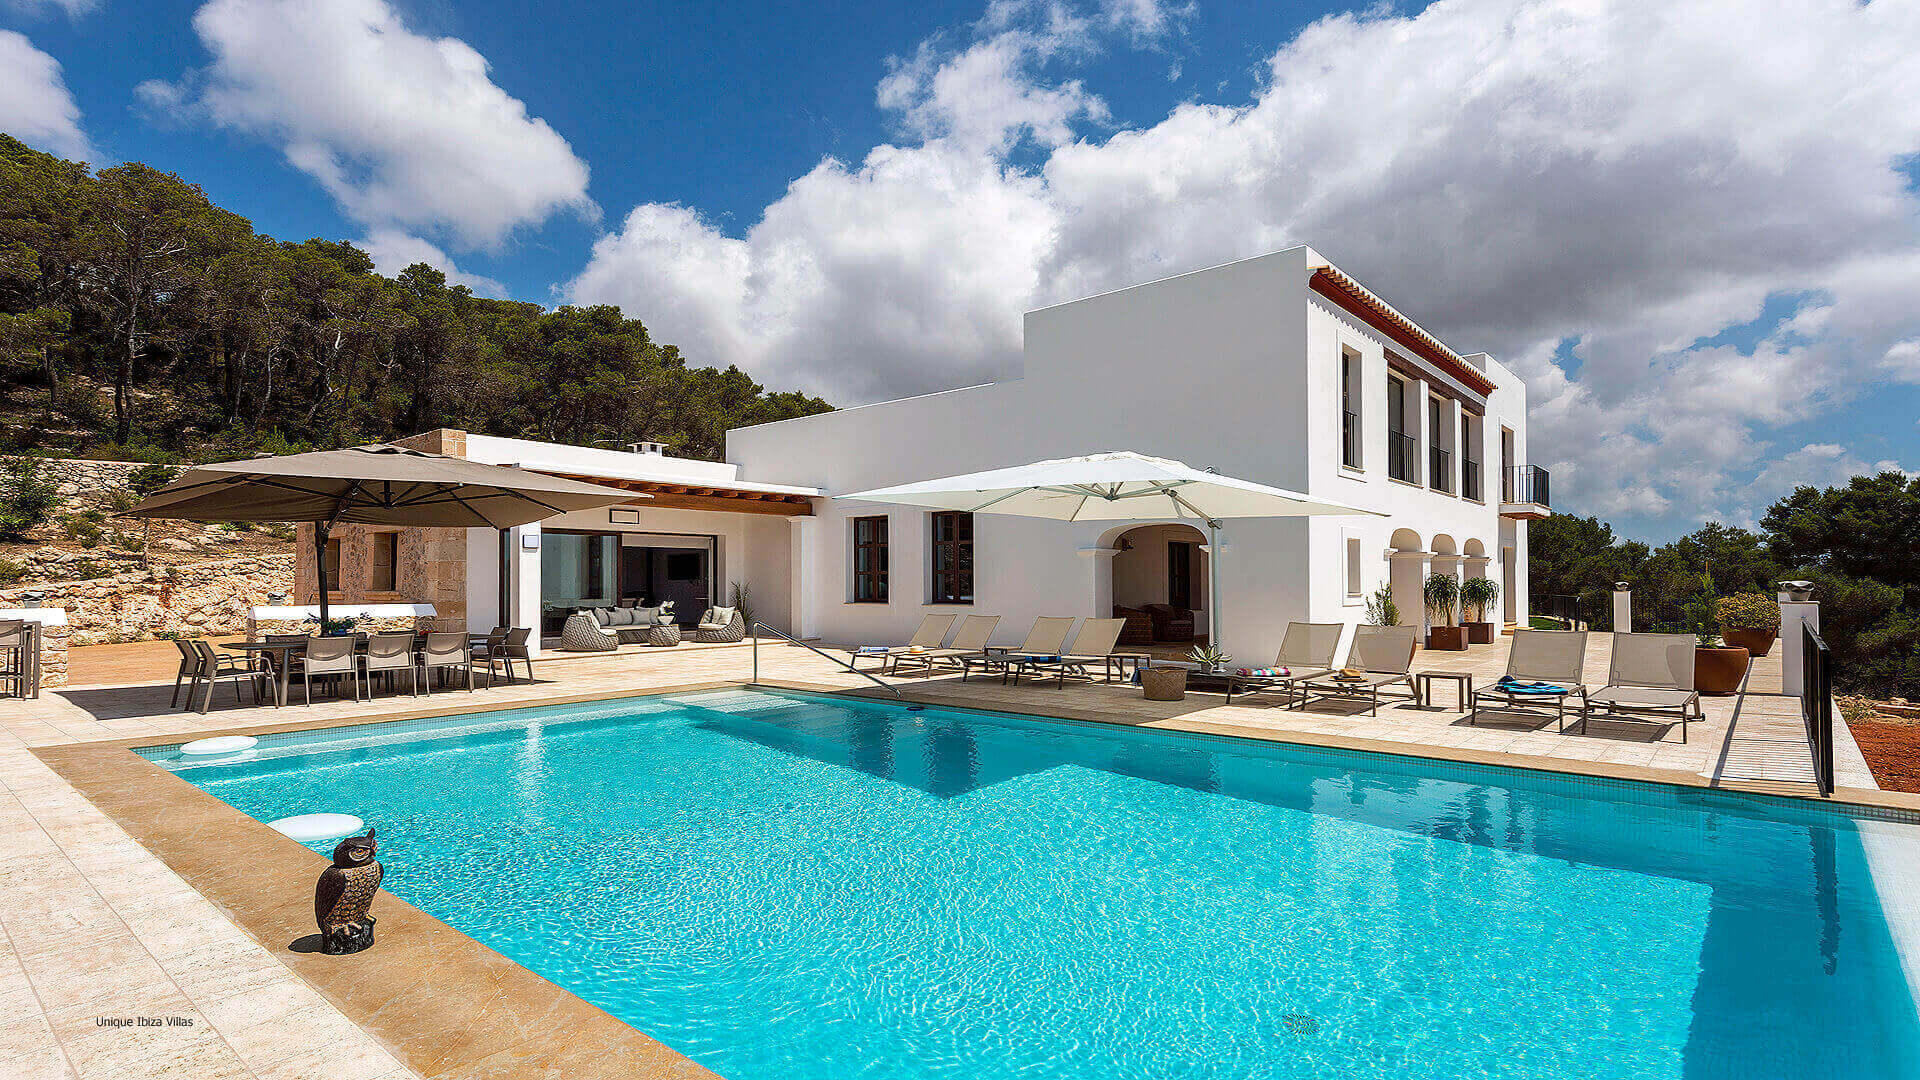 Casa Prats Ibiza 1 Santa Eulalia